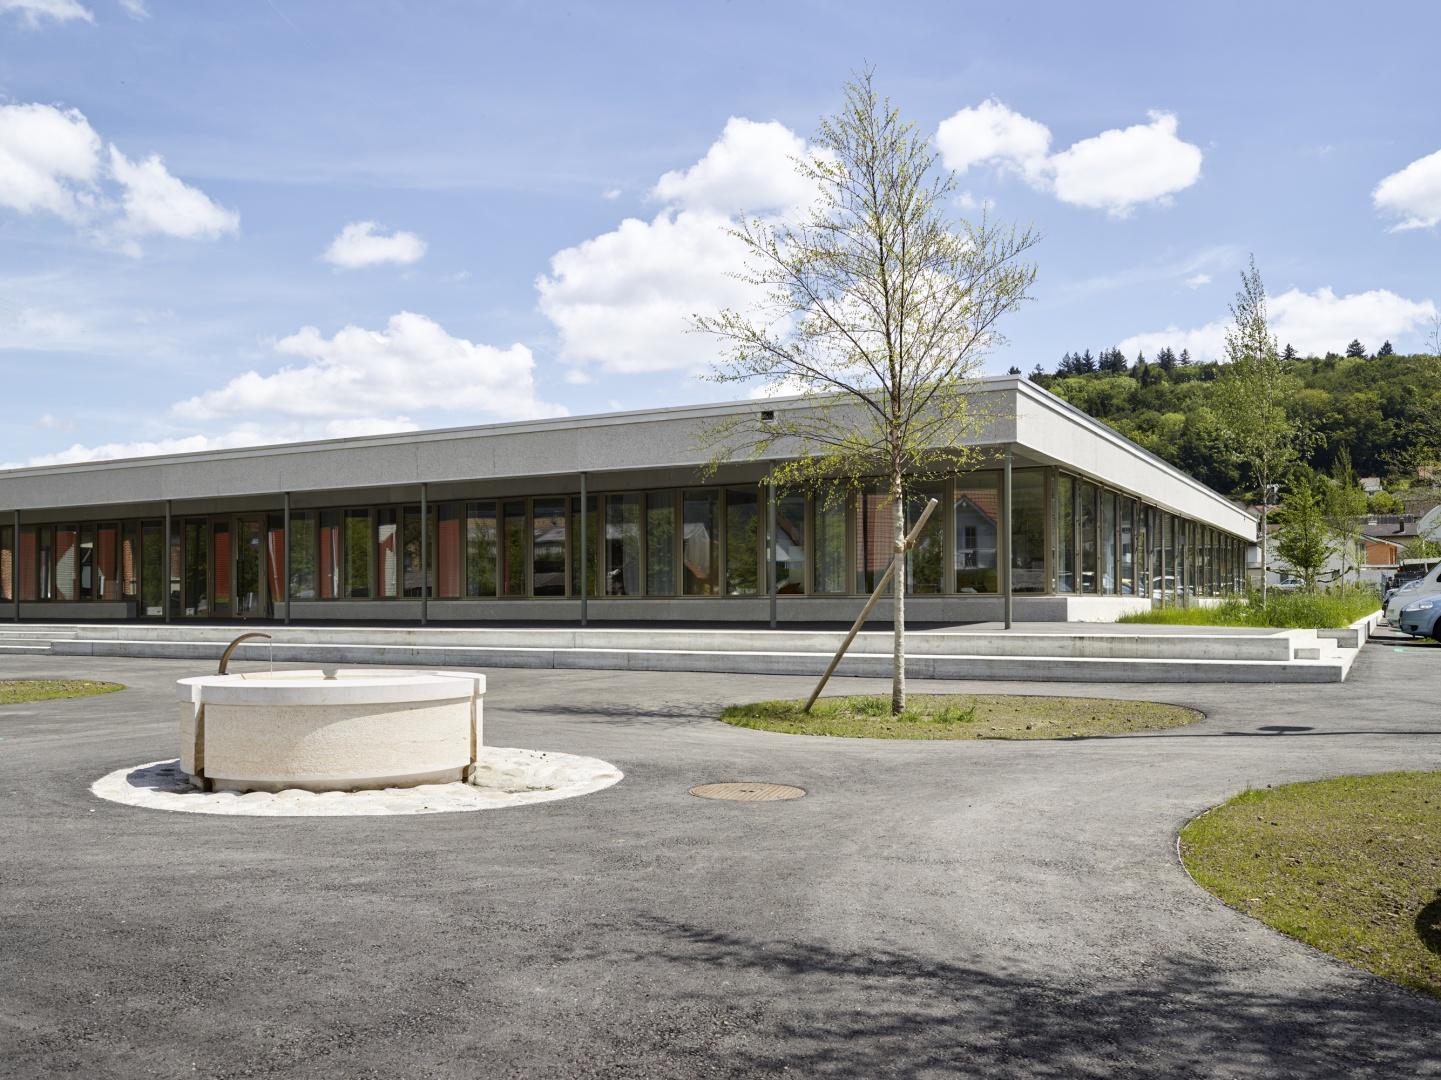 Façade, esplanade © Michael Fritschi, foto-werk gmbh,  Klingelbergstrasse 97, 4056 Basel